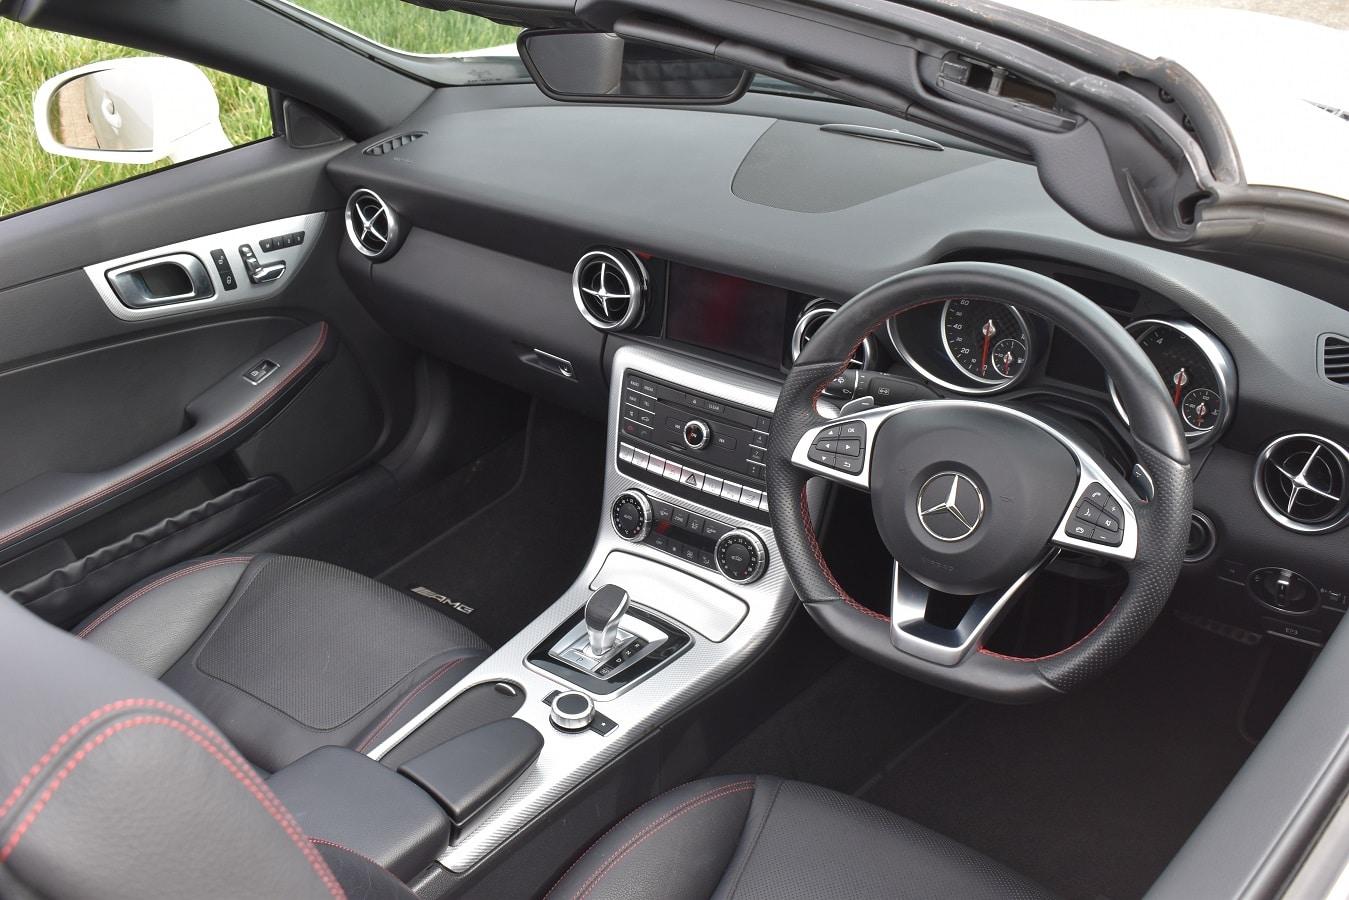 2017 Mercedes SLC 200 Roadster in Diamond White Metallic